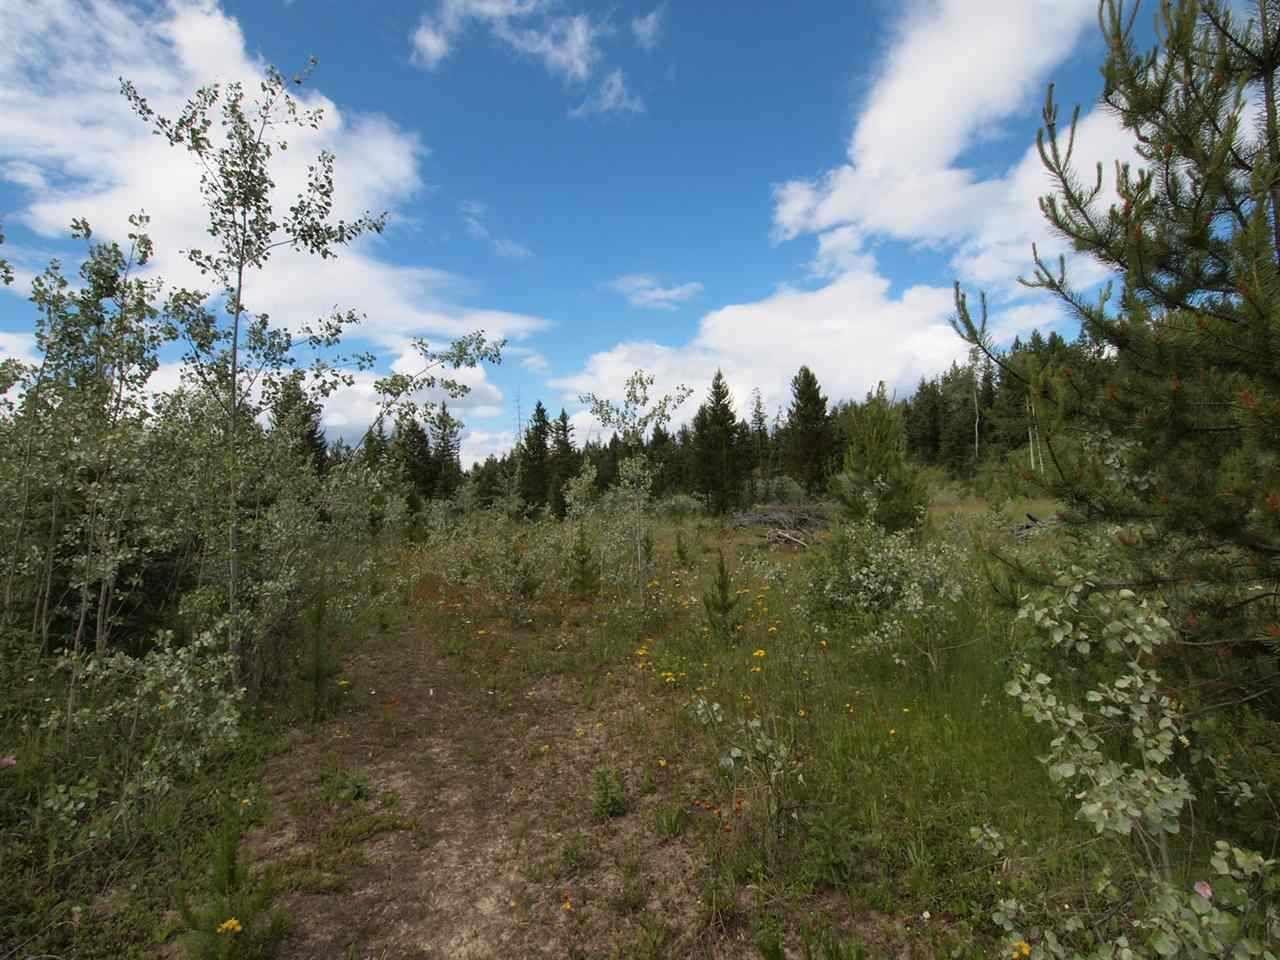 Photo 12: Photos: 4573 BAKKEN Road: Forest Grove Land for sale (100 Mile House (Zone 10))  : MLS®# R2377308